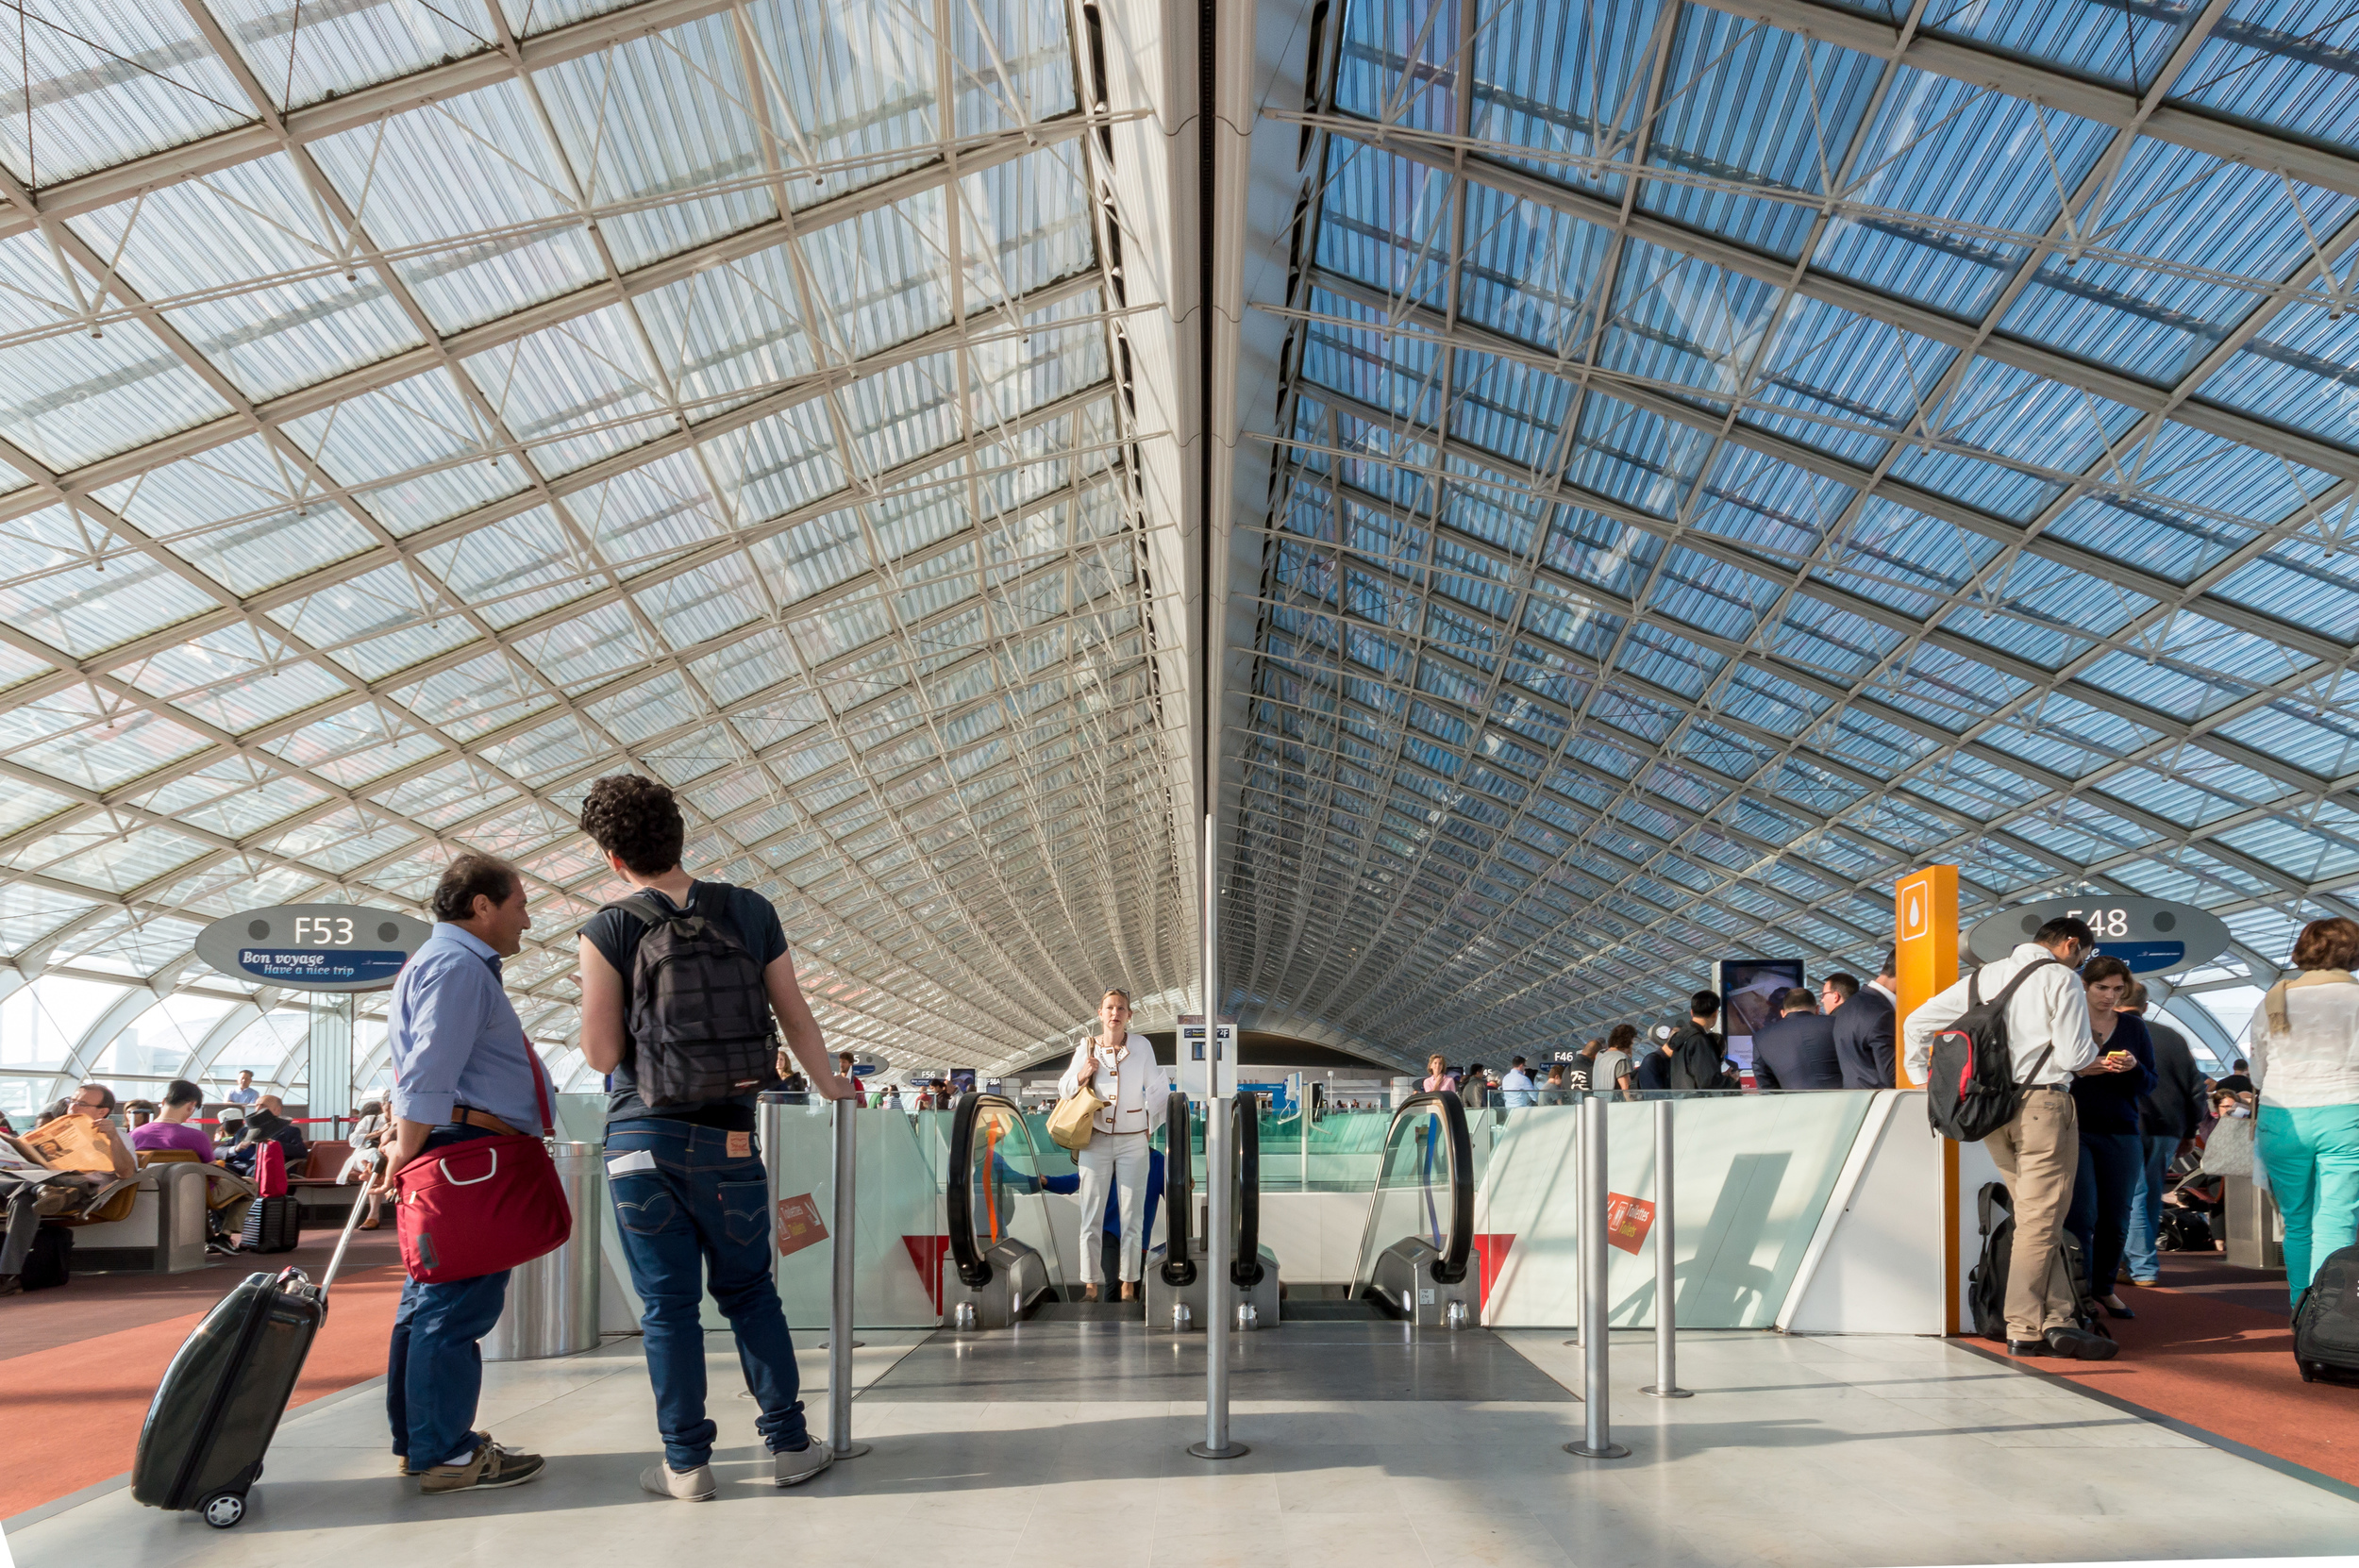 Charles-De-Gaulle luchthaven, Architectuurfotografie Frankrijk